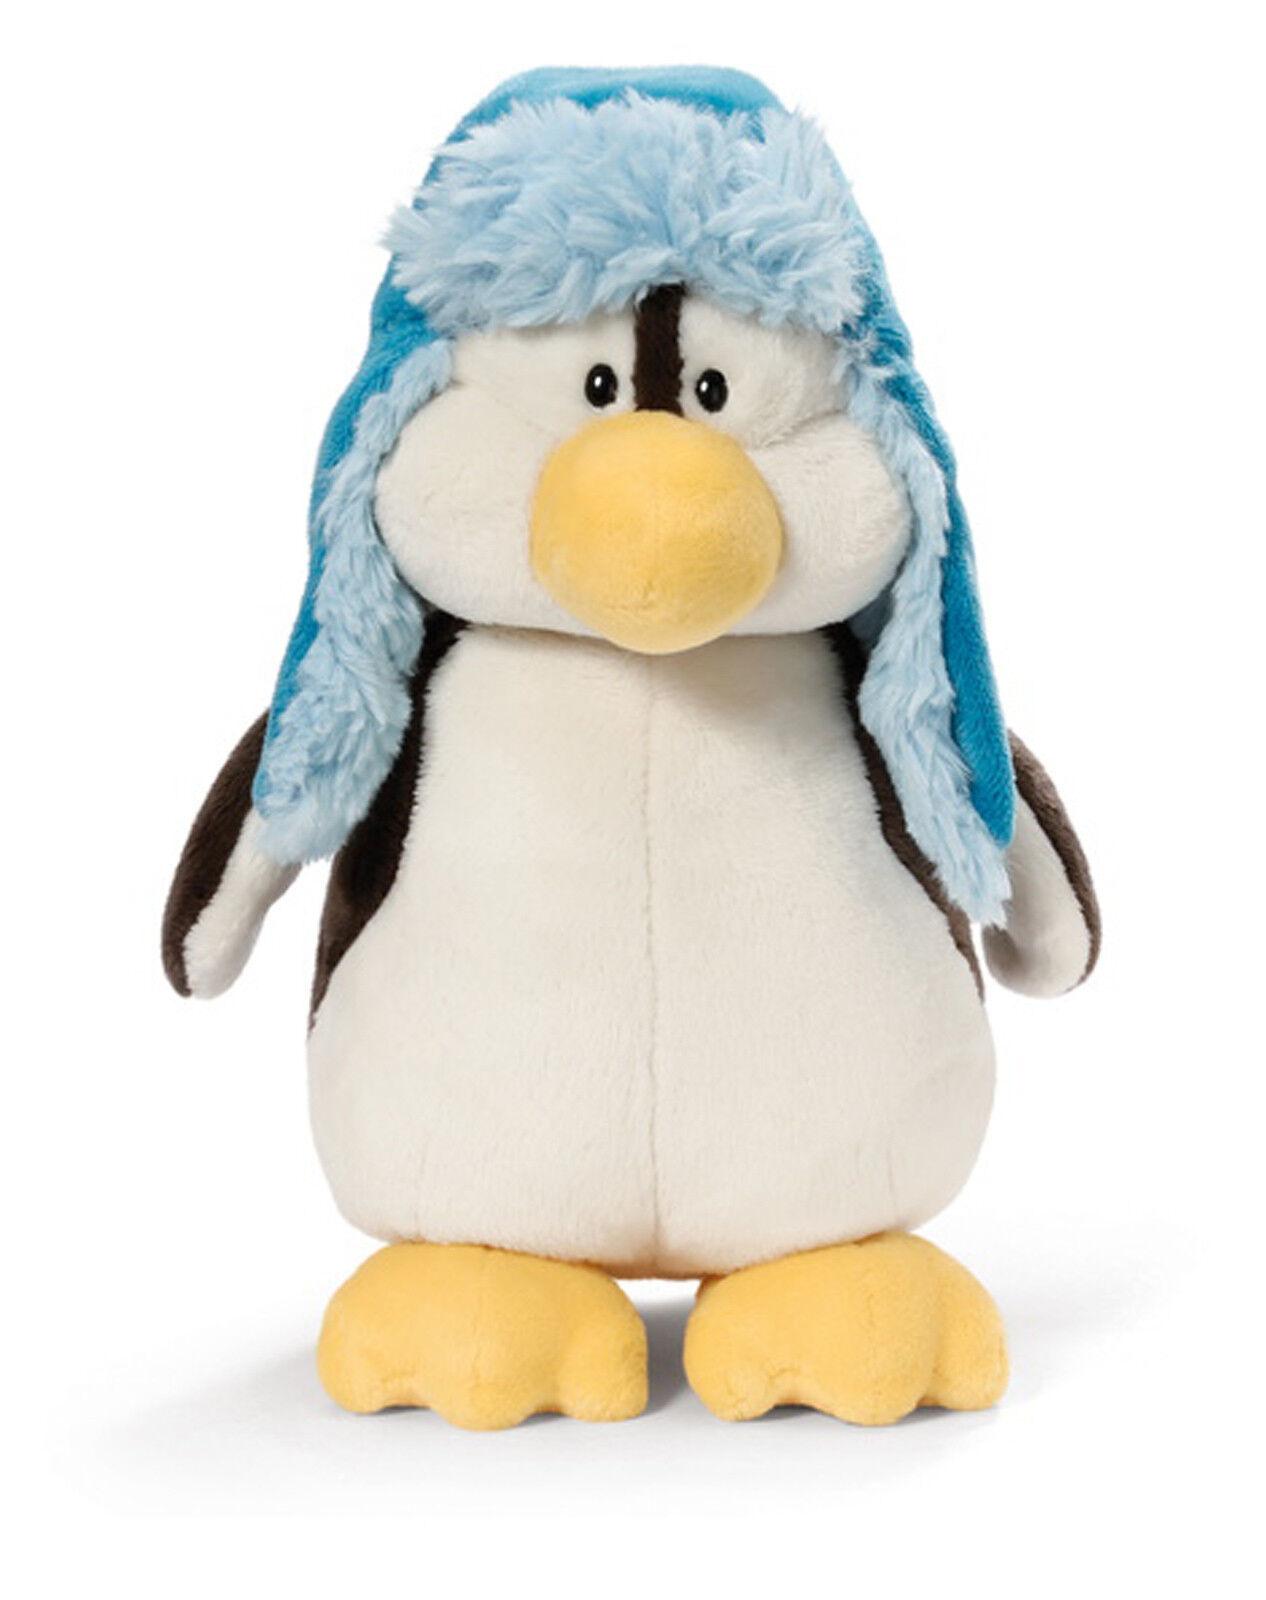 NICI Pinguin Ilja Schlenker Plüschtier Kuscheltier Stofftier Plüsch Plüschtier